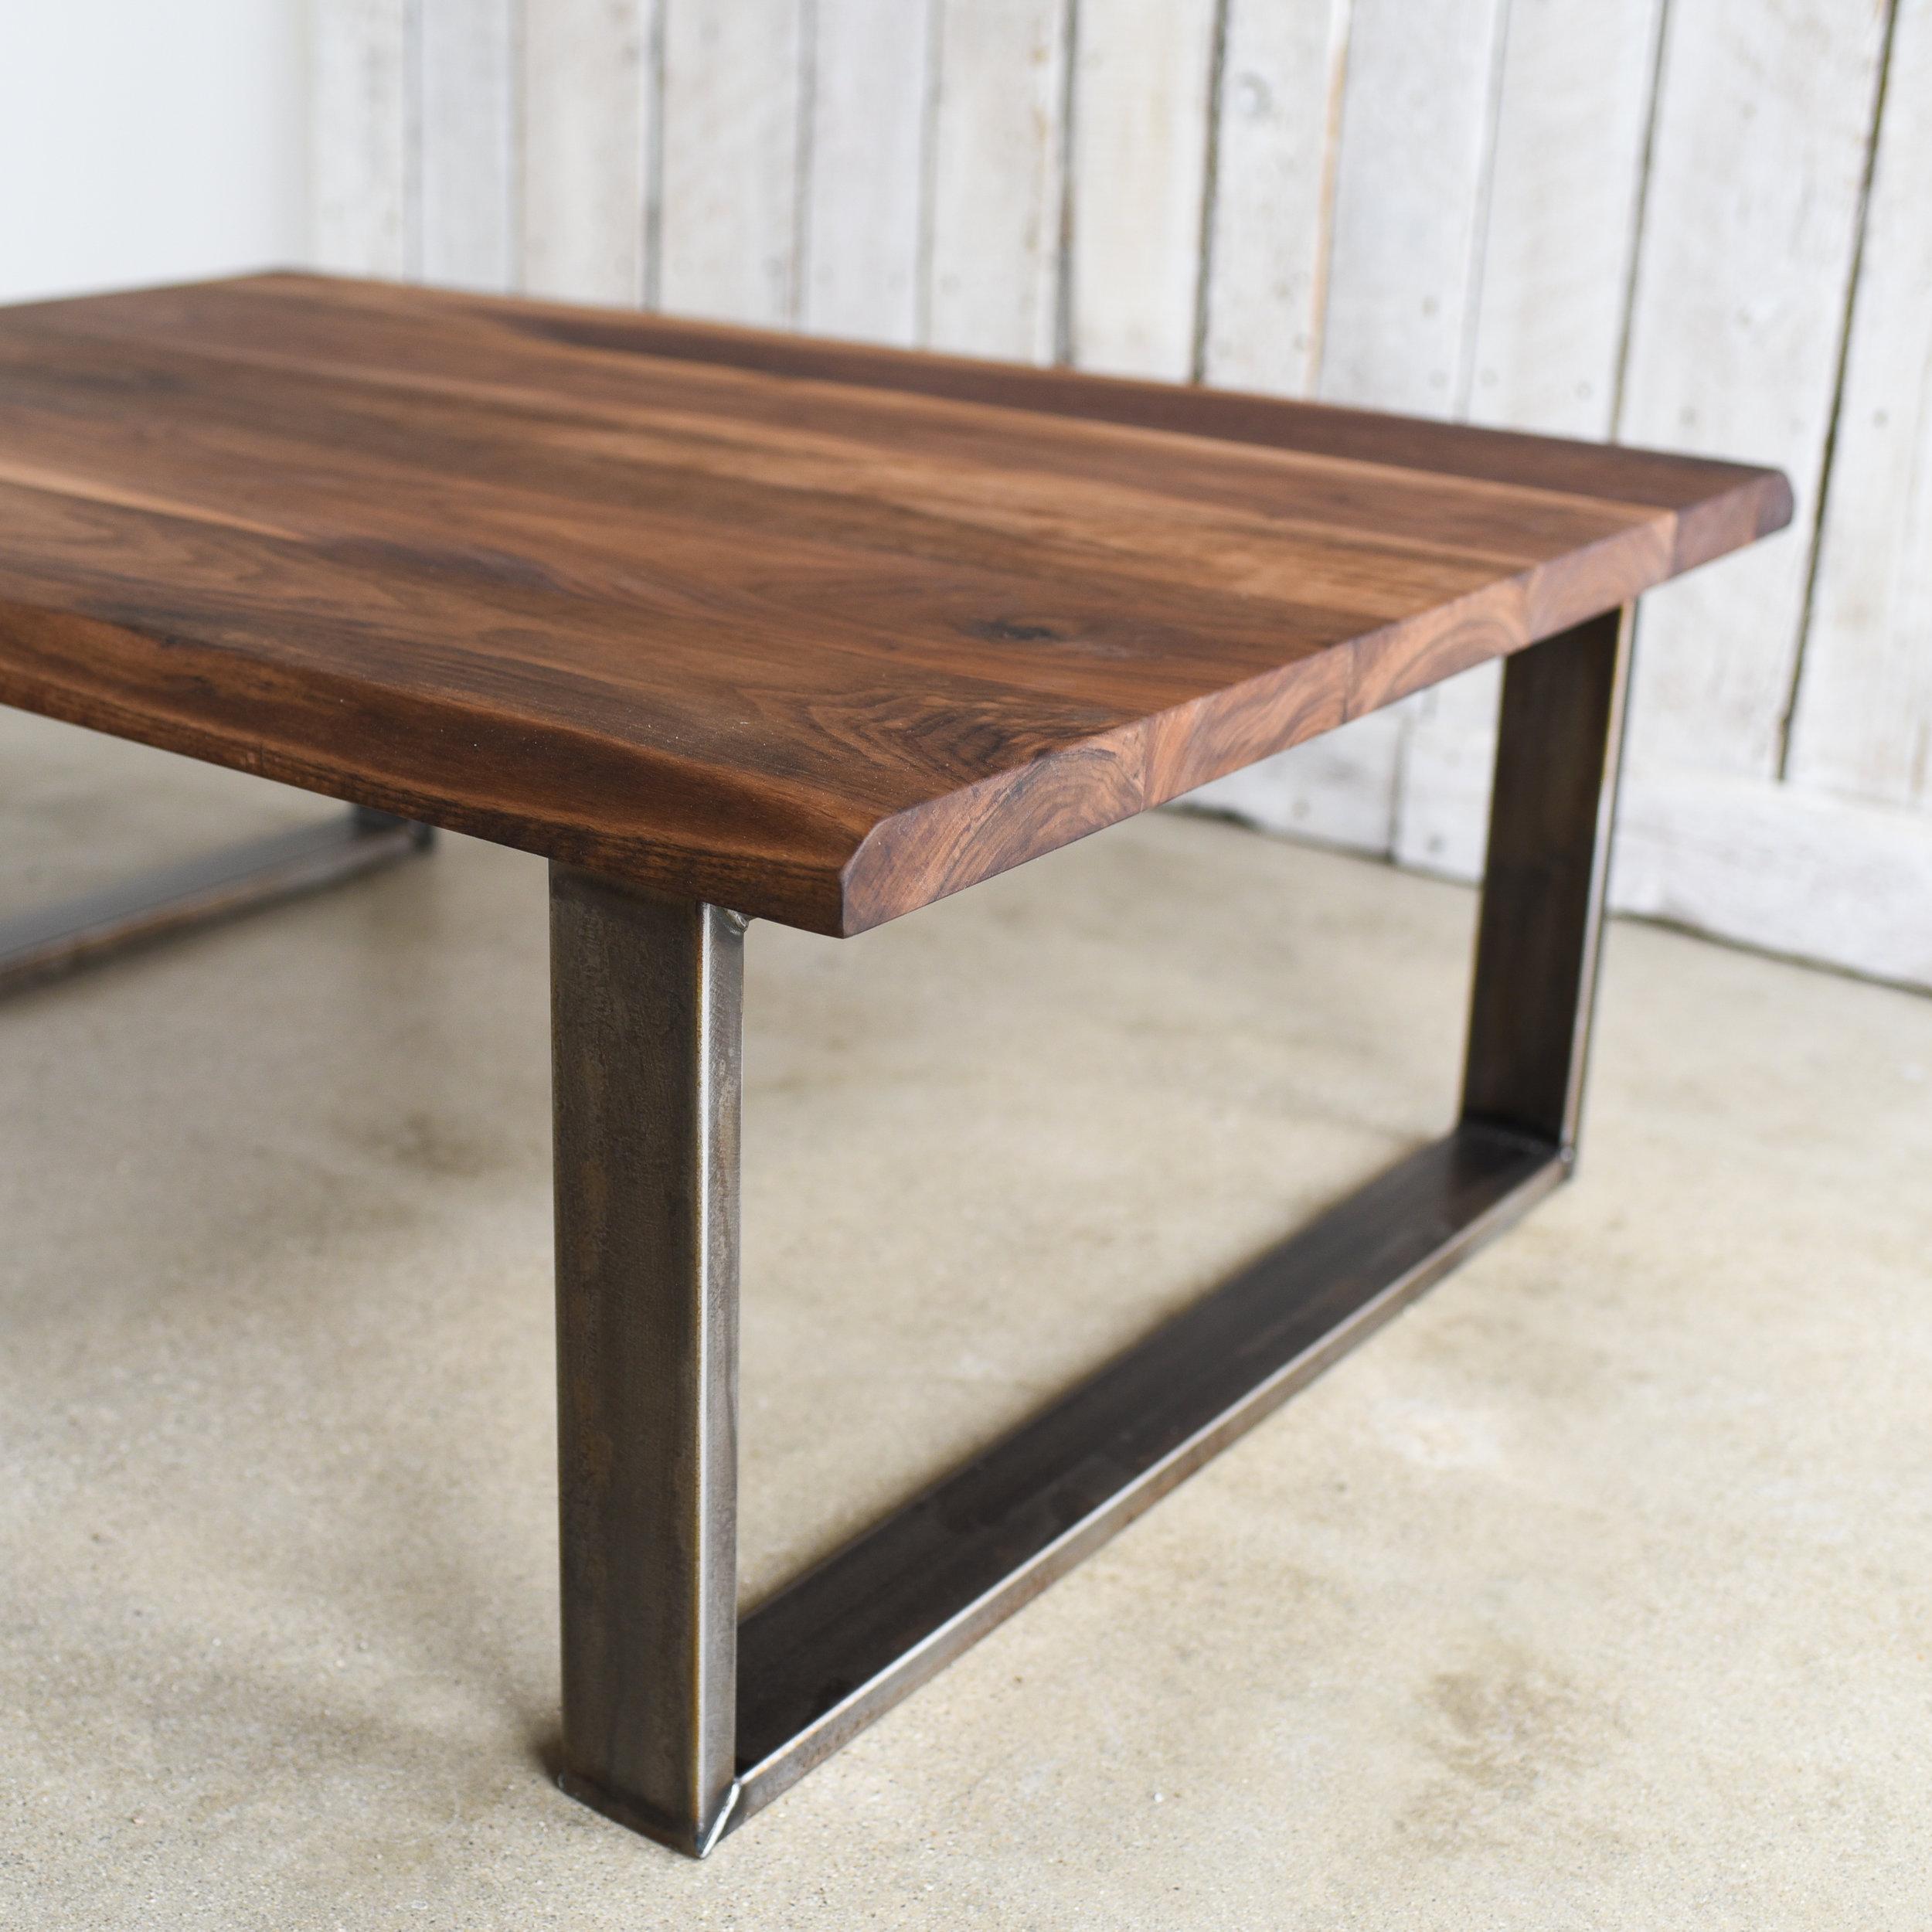 walnut live edge coffee table industrial u shaped steel legs what we make